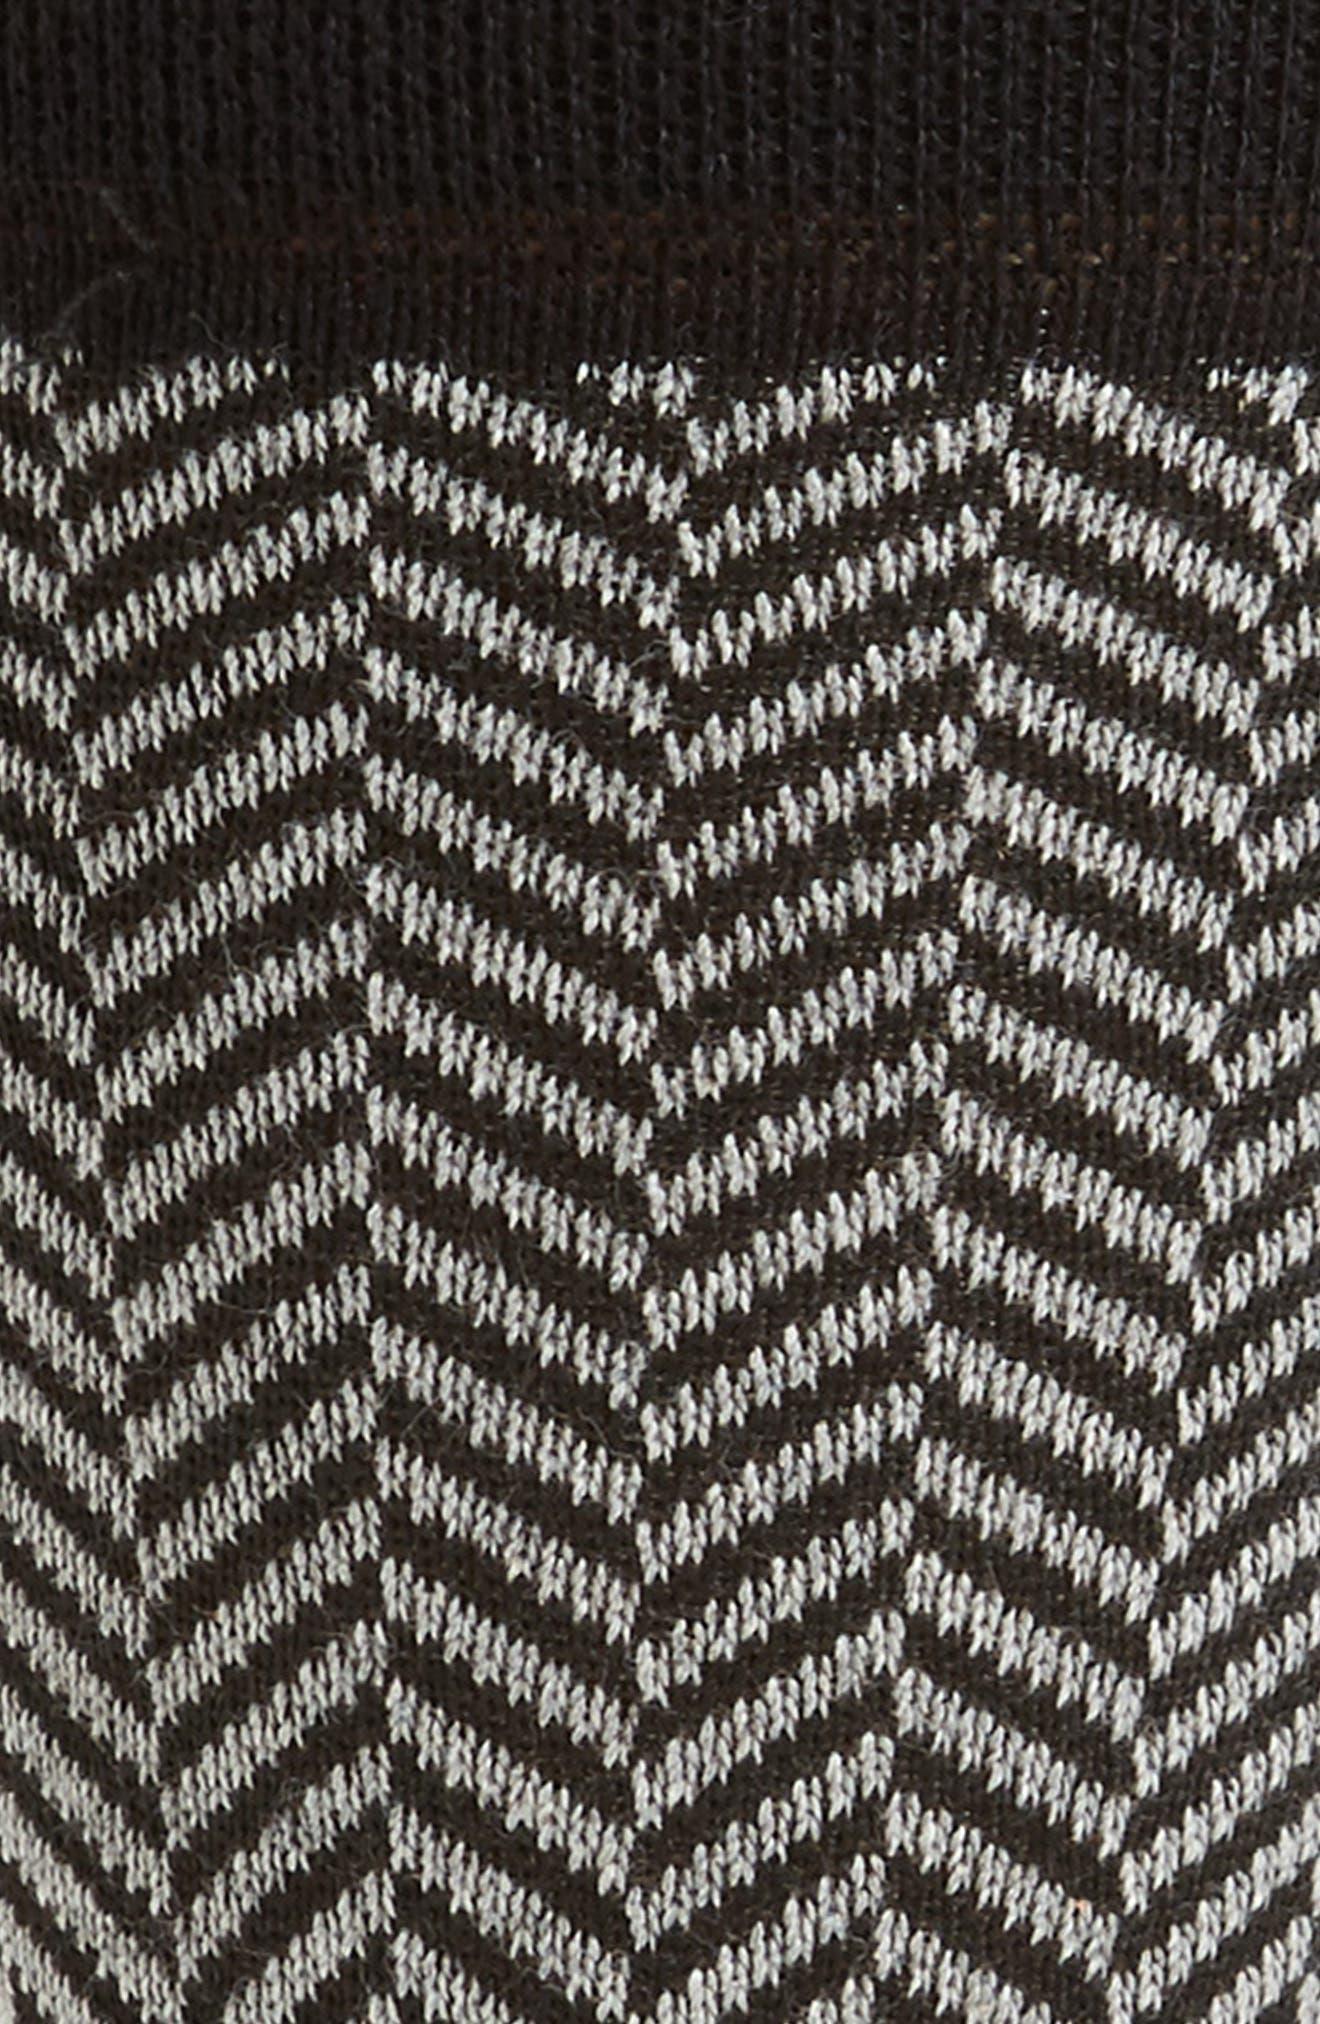 Ronimow Herringbone Socks,                             Alternate thumbnail 2, color,                             001